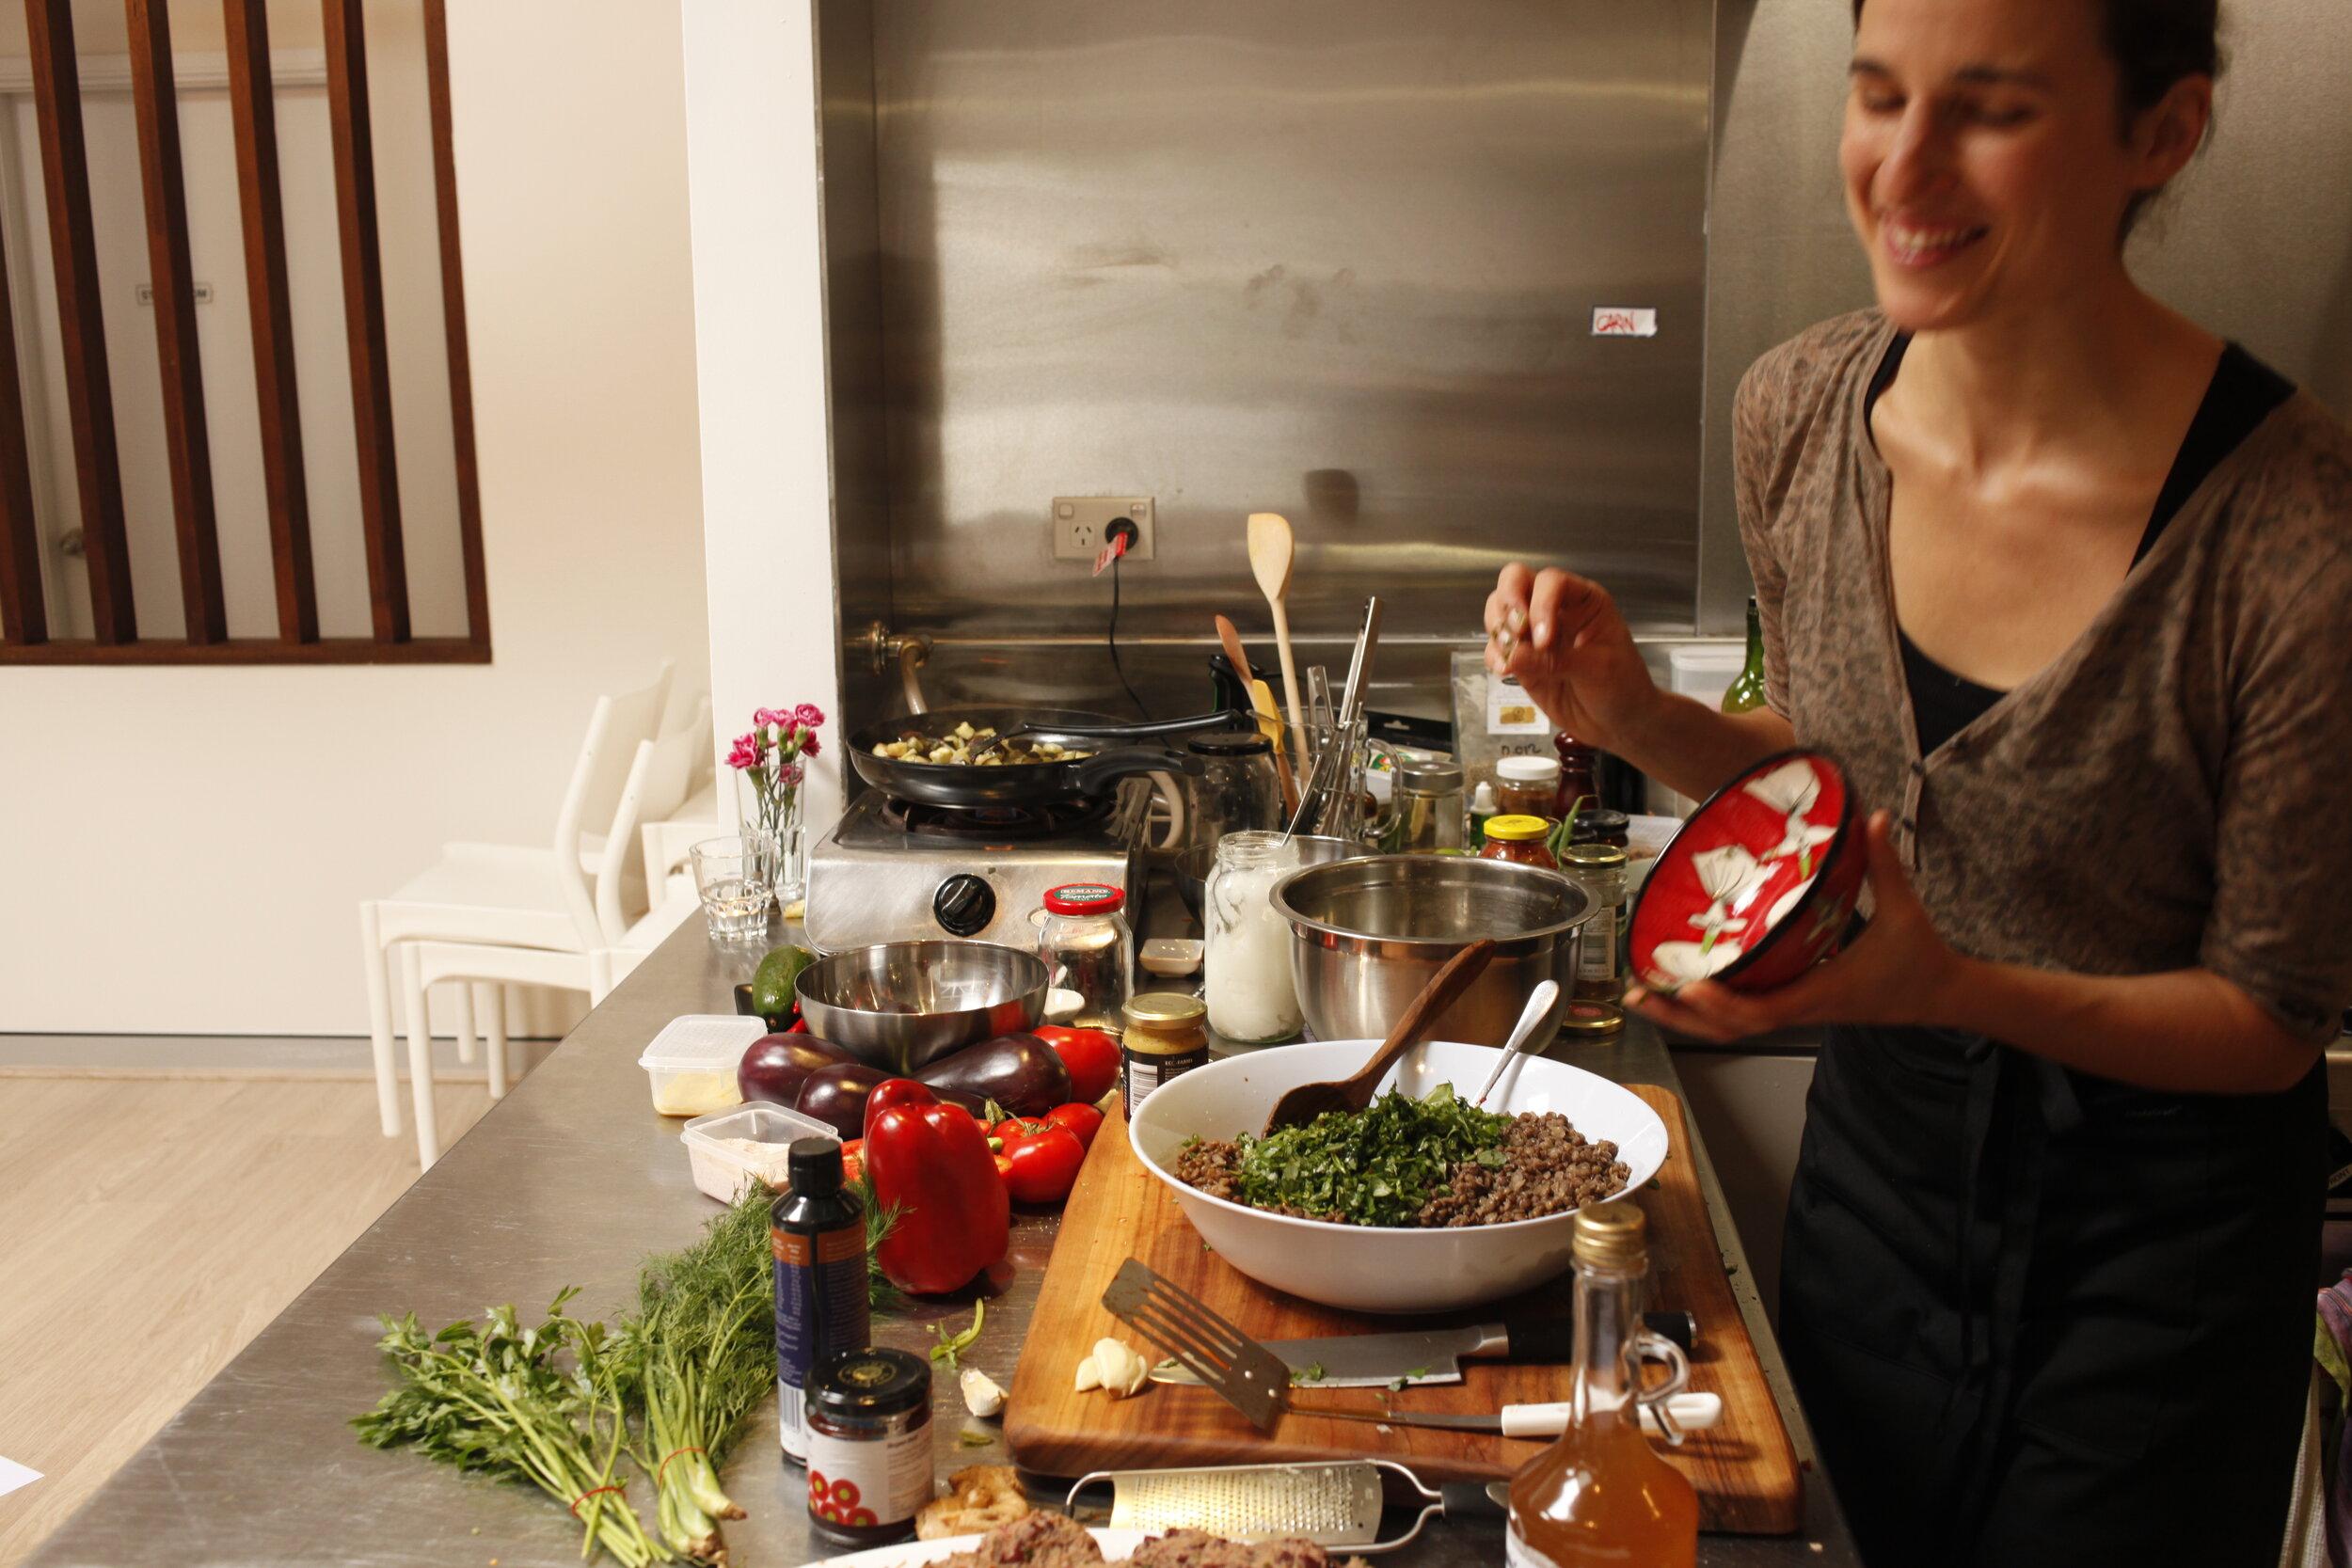 Gala's Cooking Classes - Vegan, vegetarian, carnivore, pescatarian, herbivore, omnivore, whatever, everyone is welcome!